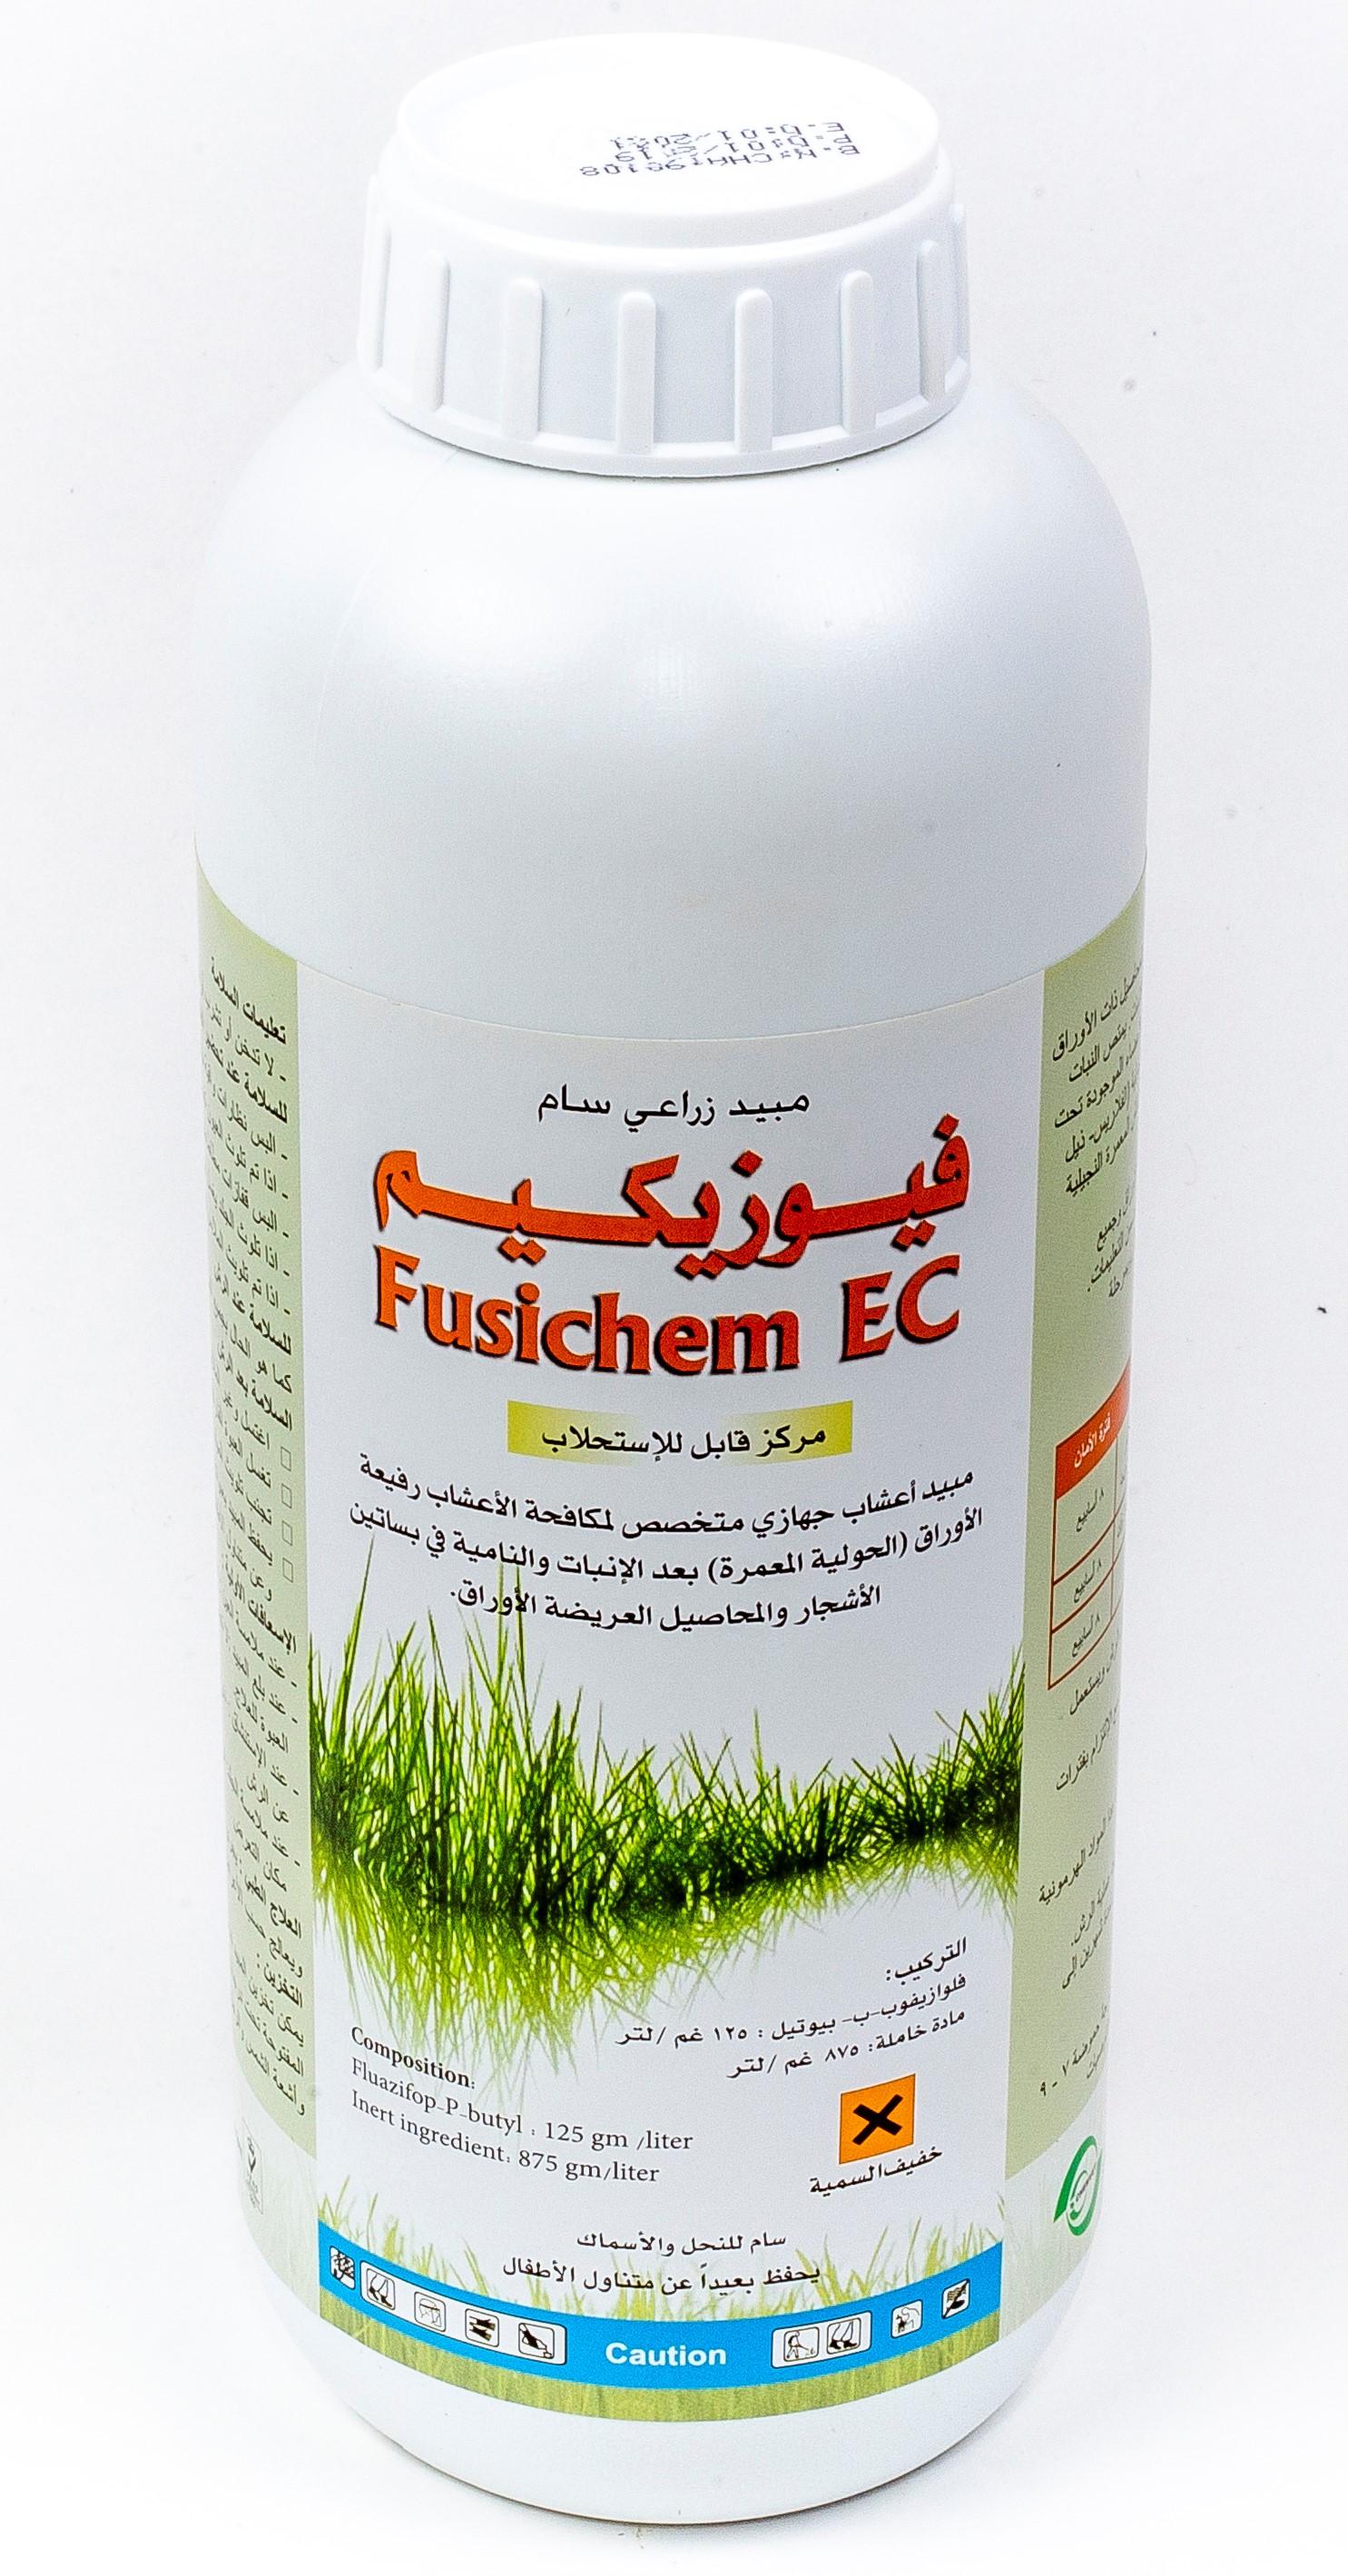 Fusichem EC